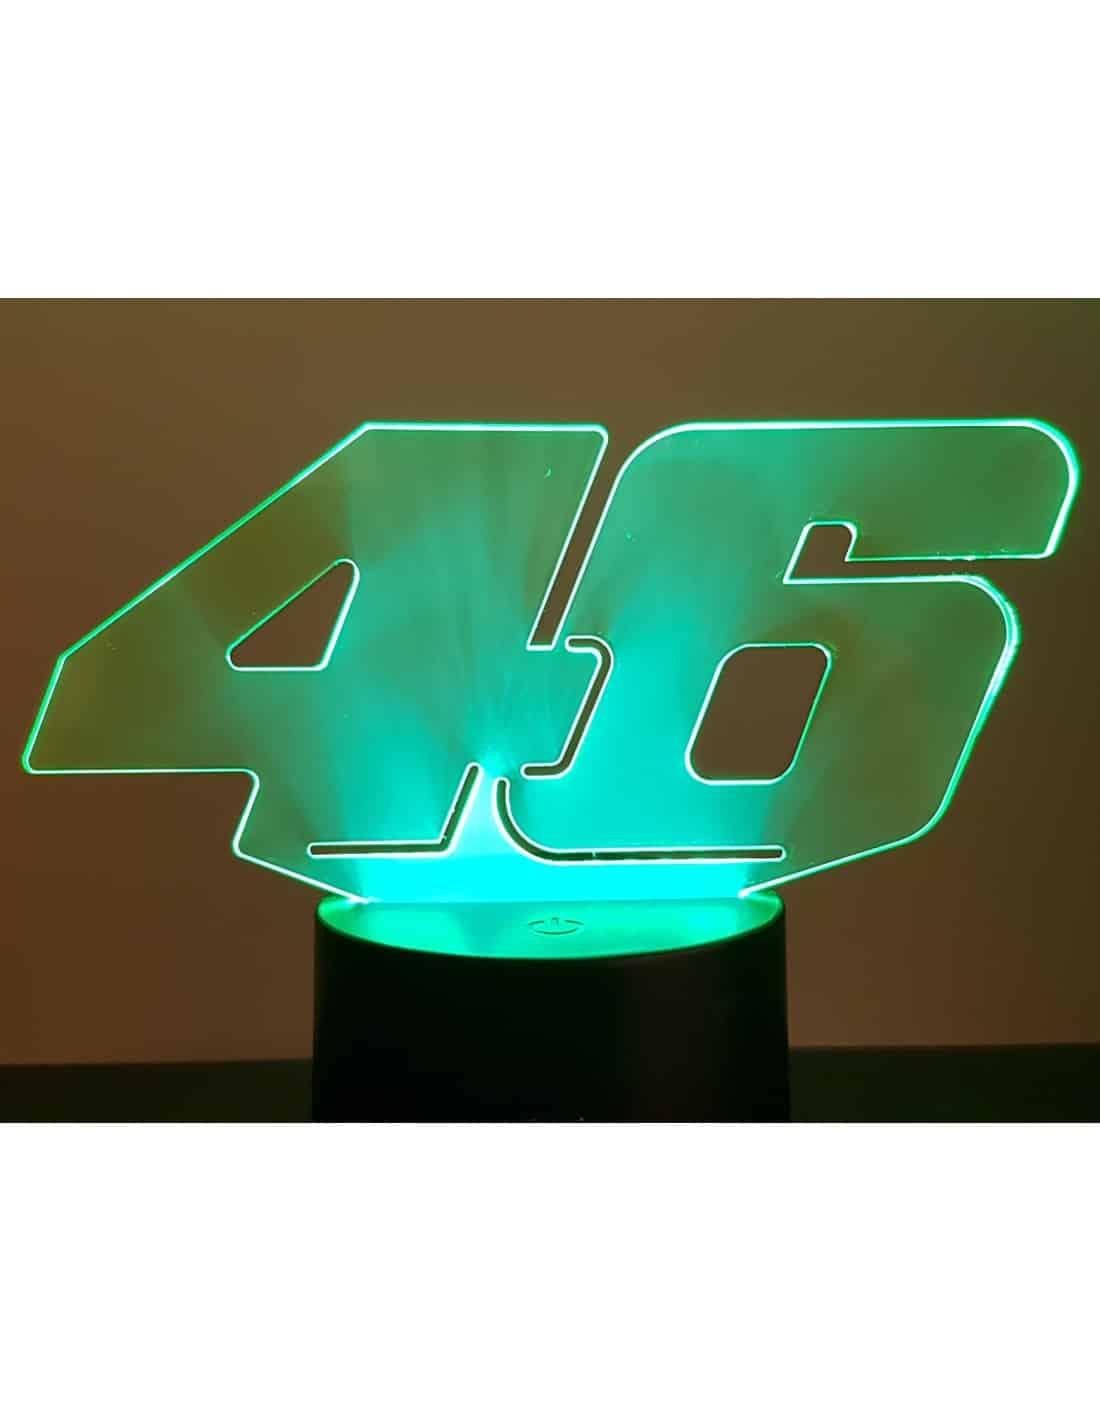 Valentino Rossi 46 3D Illusion Led Lamp